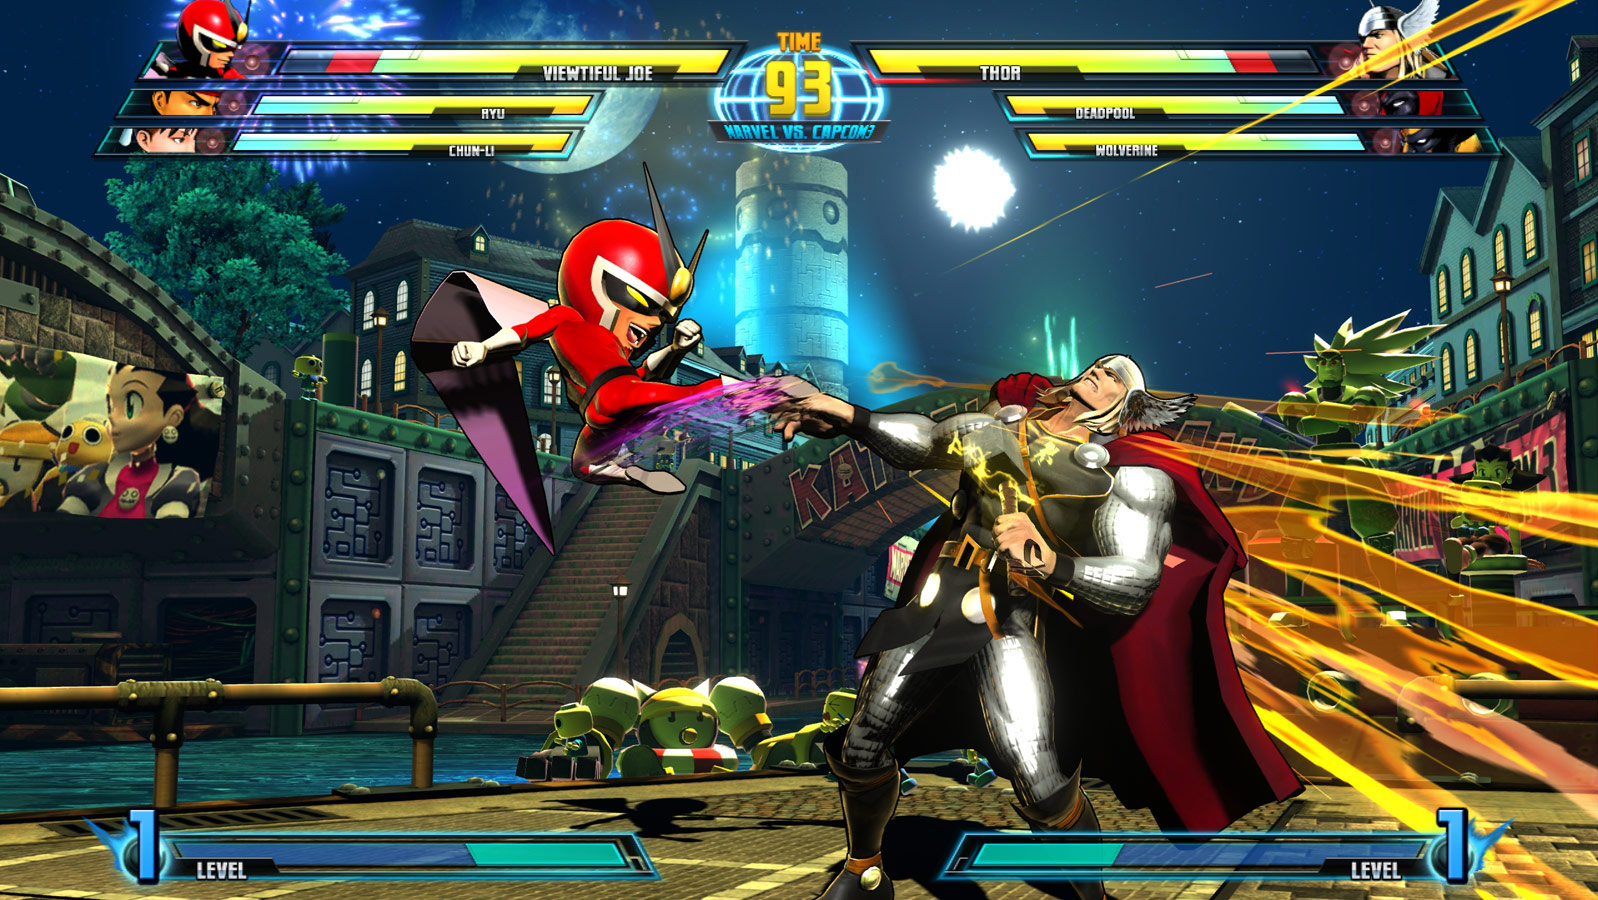 Marvel vs. Capcom 3 screen shot Aug. 18 image #5